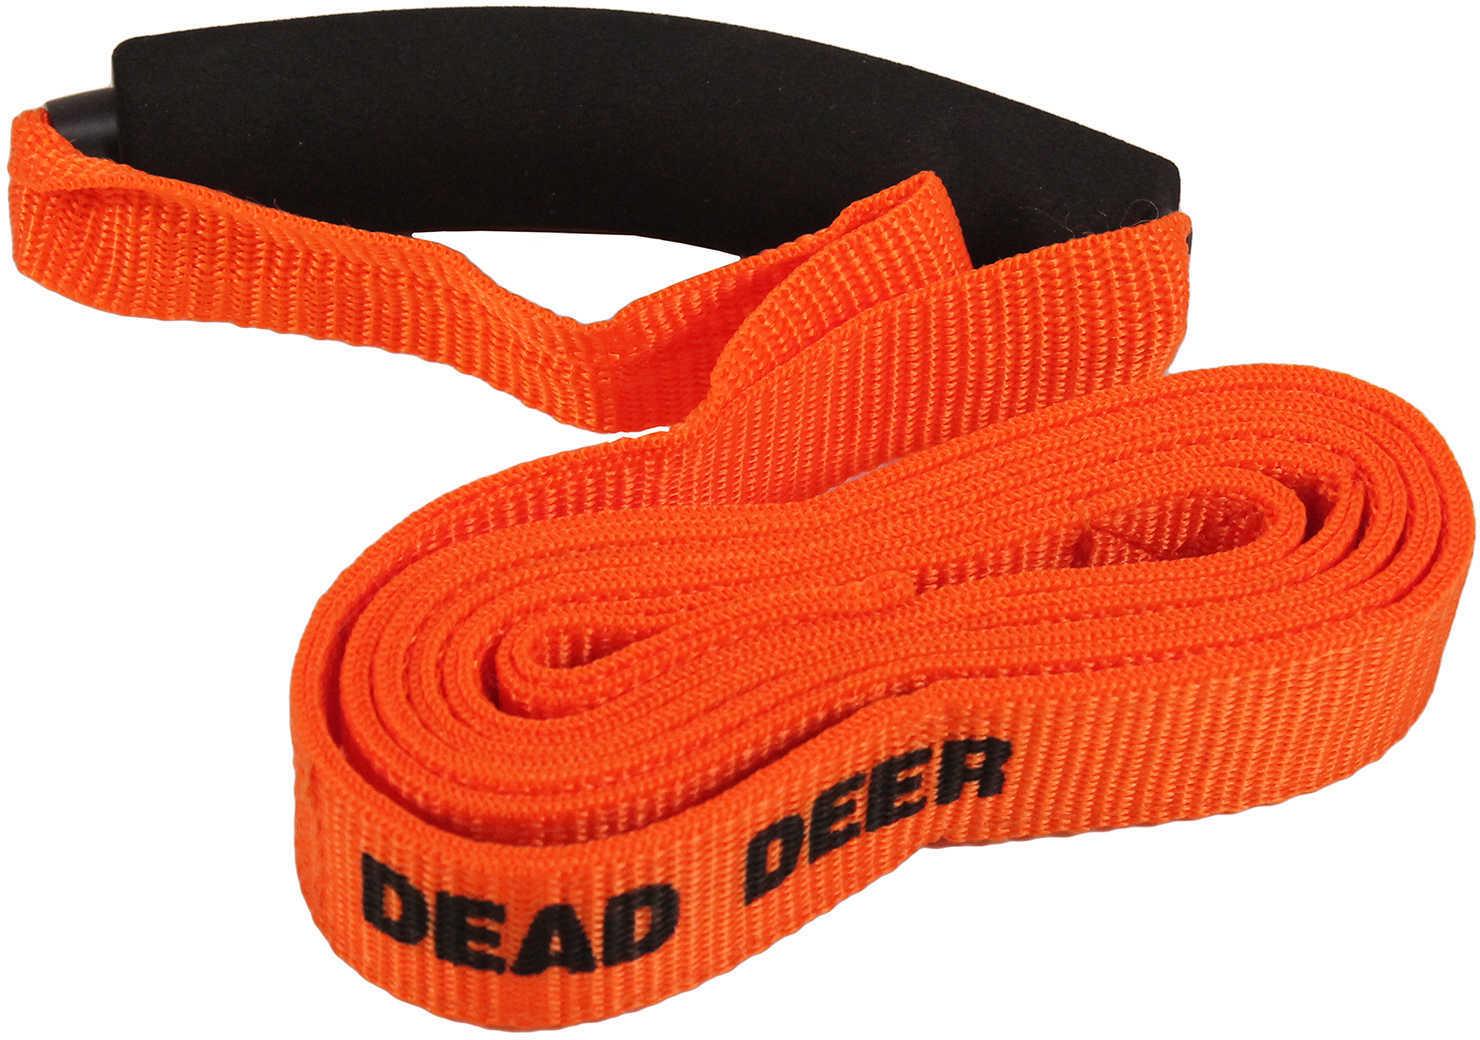 Do-All Traps Pro Deer Drag Md: Odd26